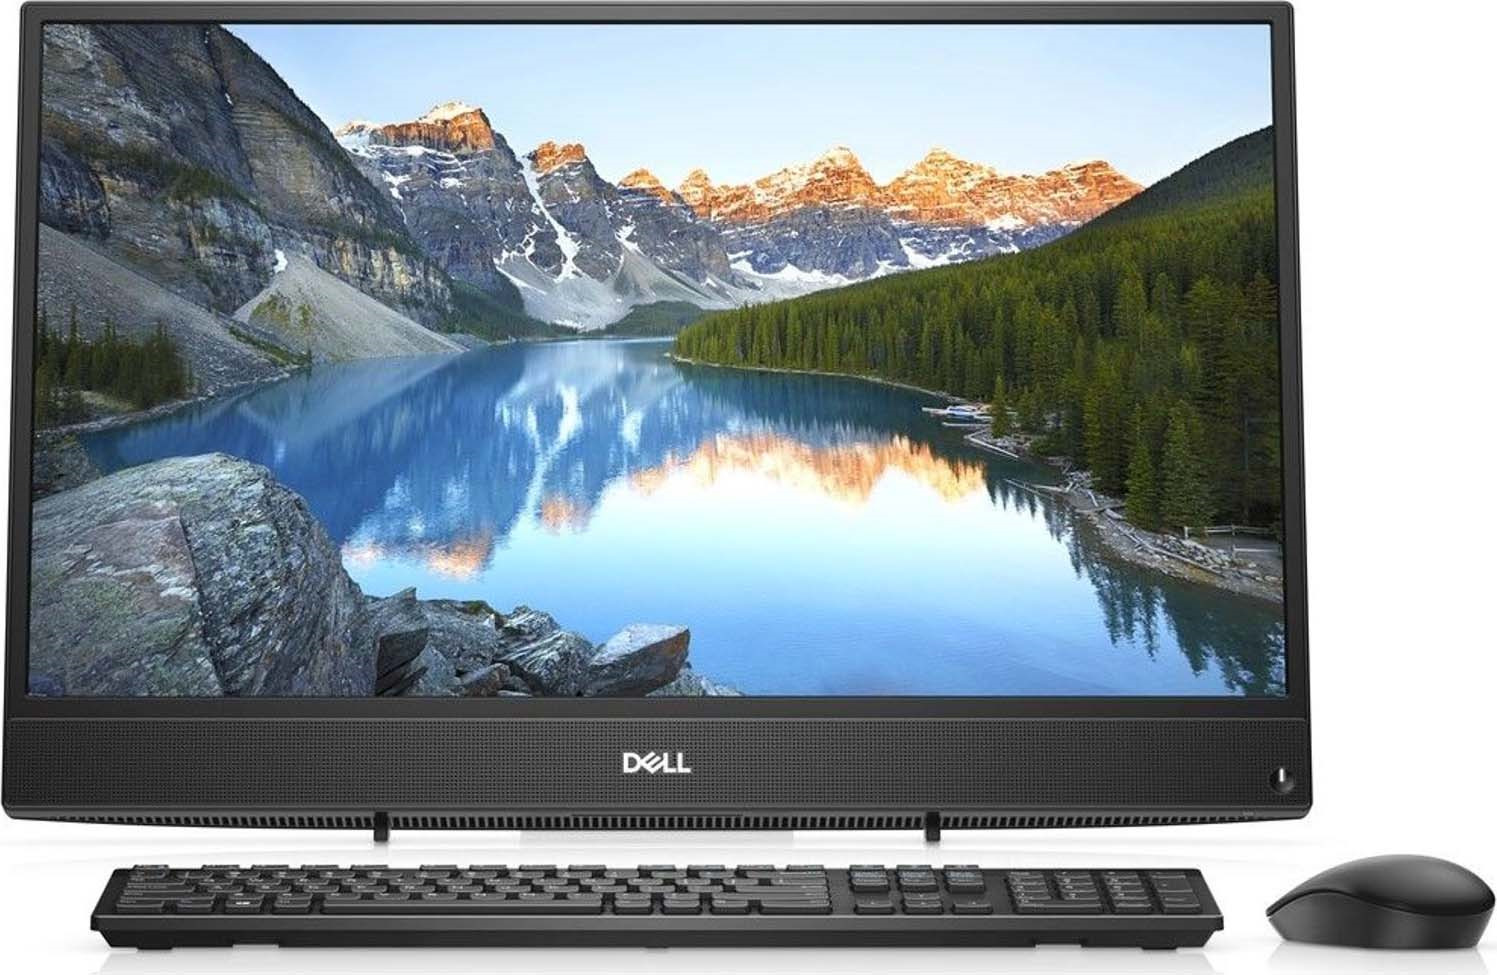 купить Моноблок Dell Inspiron 3477, 3477-7301, 23.8